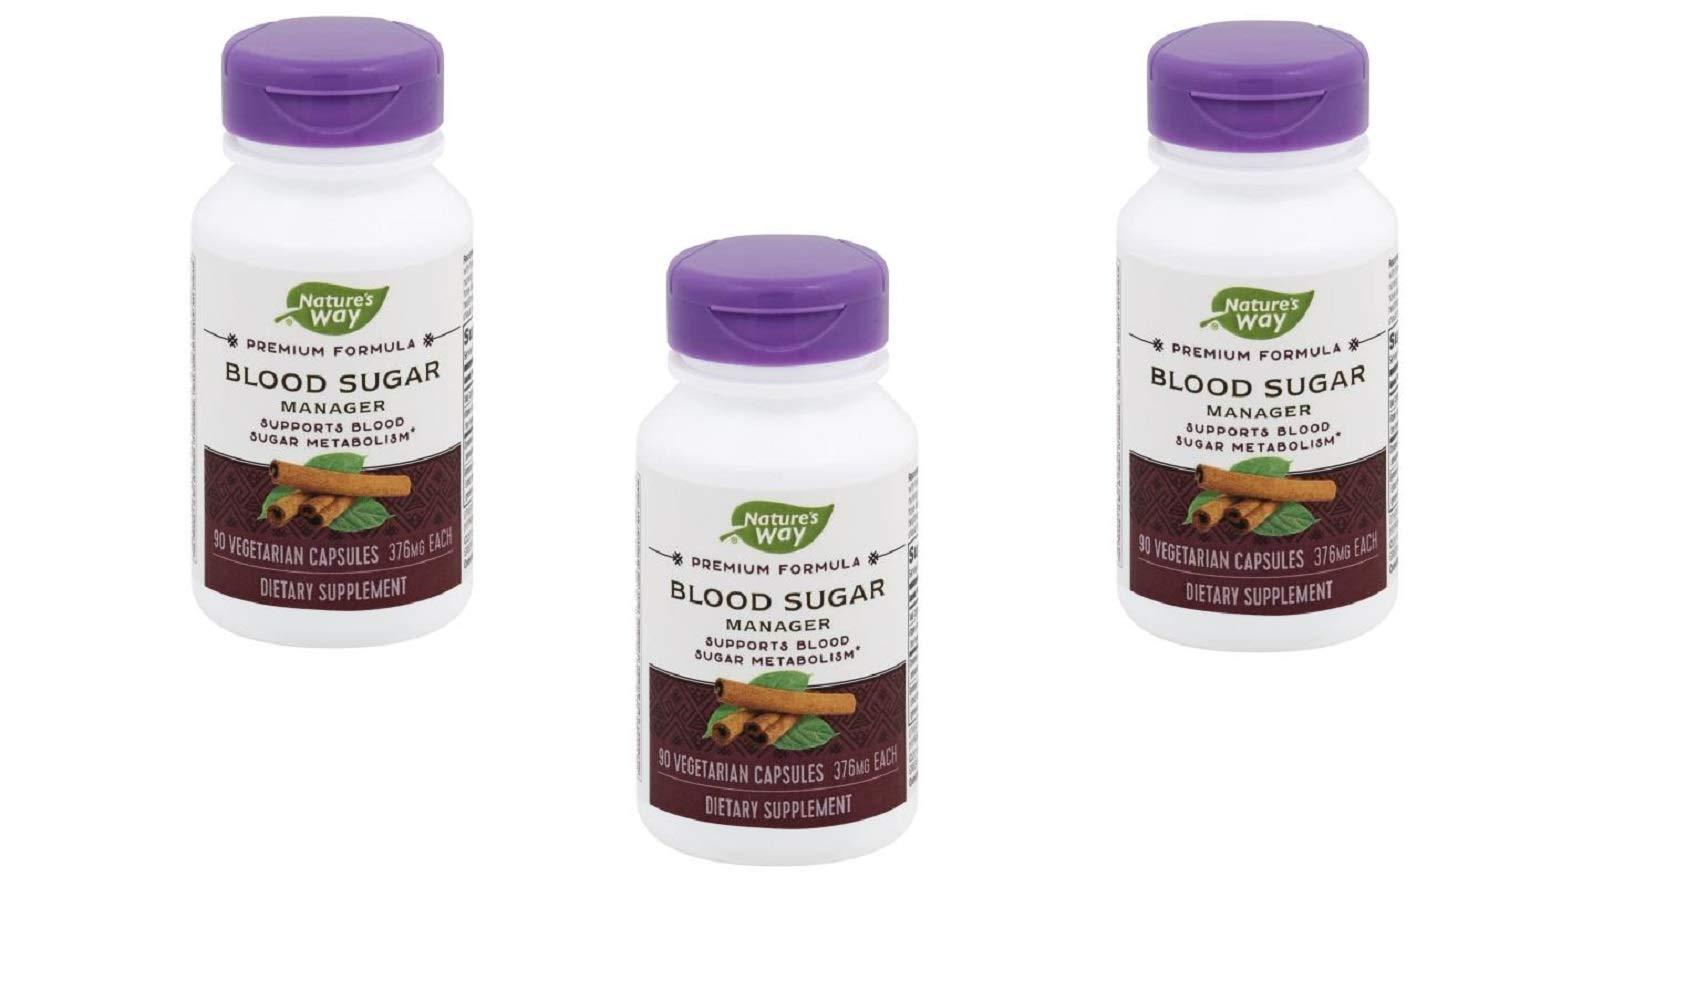 Natures Way Blood Sugar with Gymnema Capsule, 381 Mg - 90 per pack - 3 packs per case.